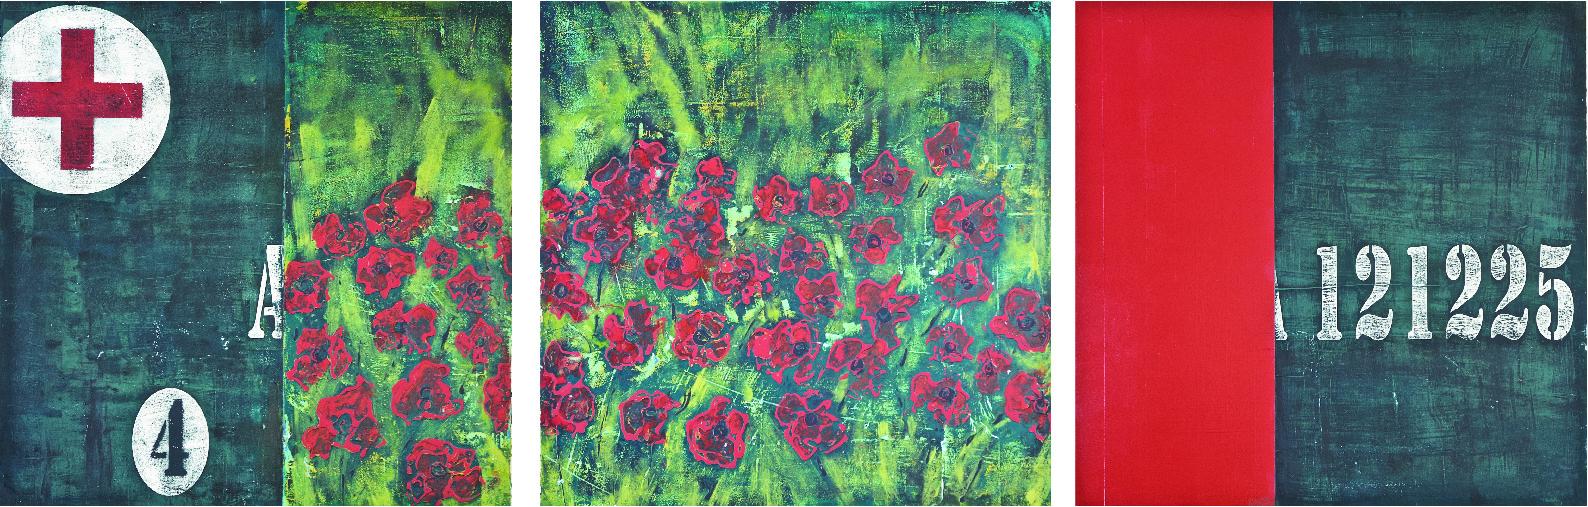 """In Flanders Fields the Poppies Grow"""